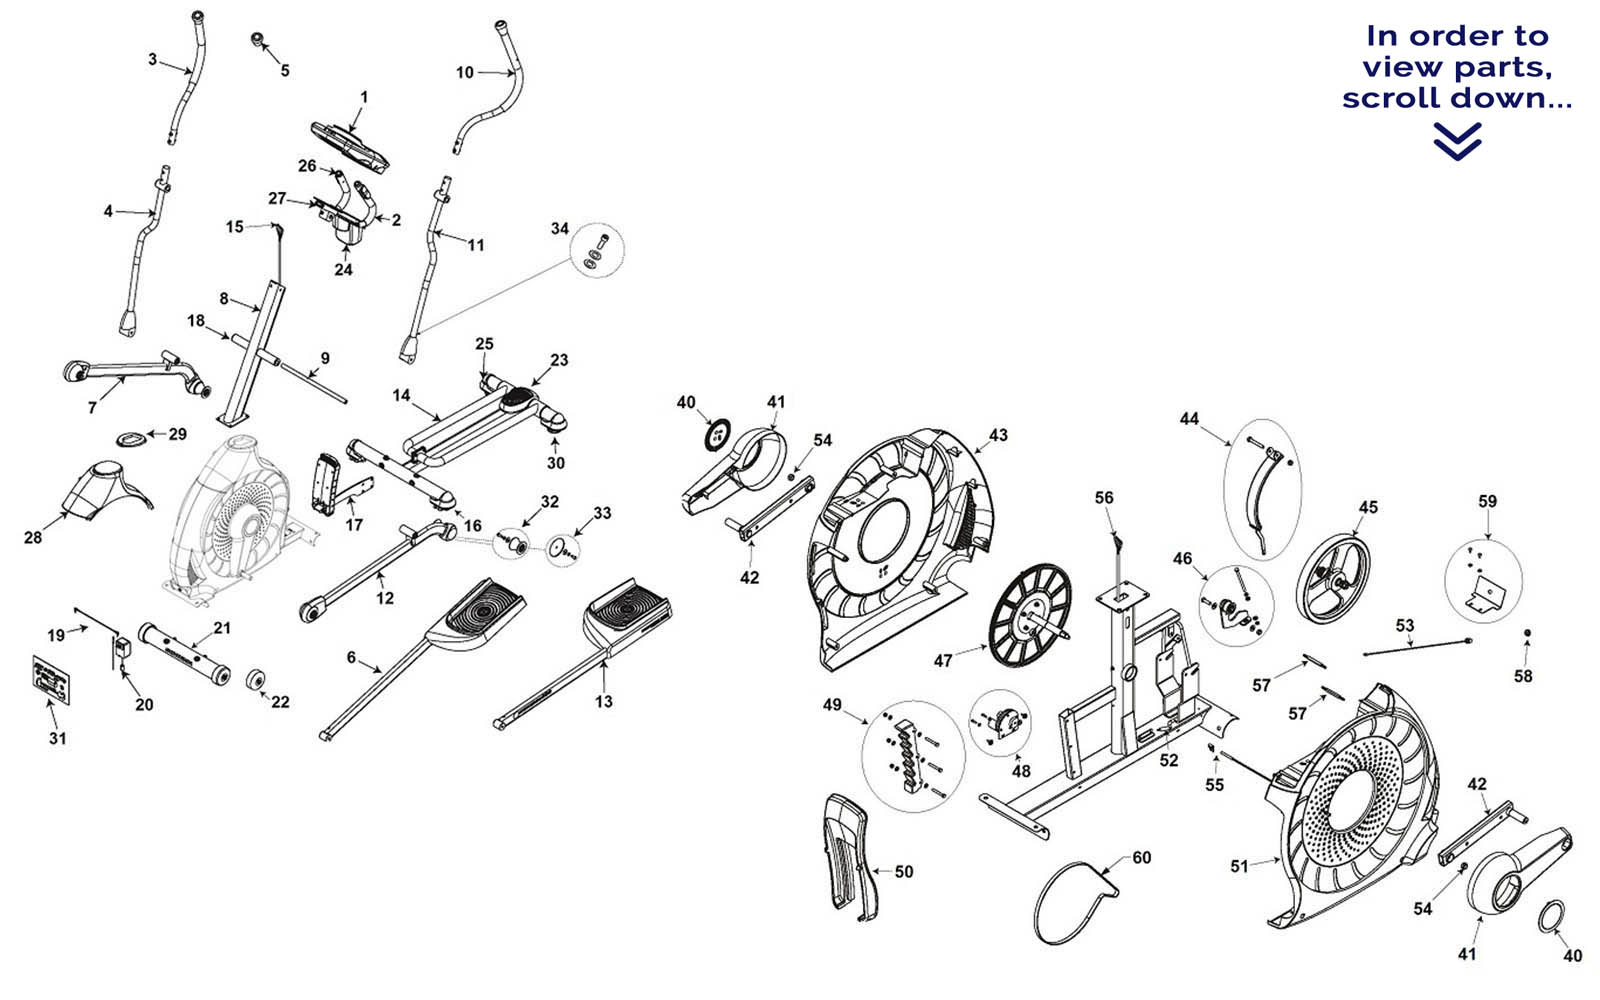 hight resolution of schwinn 430 elliptical parts